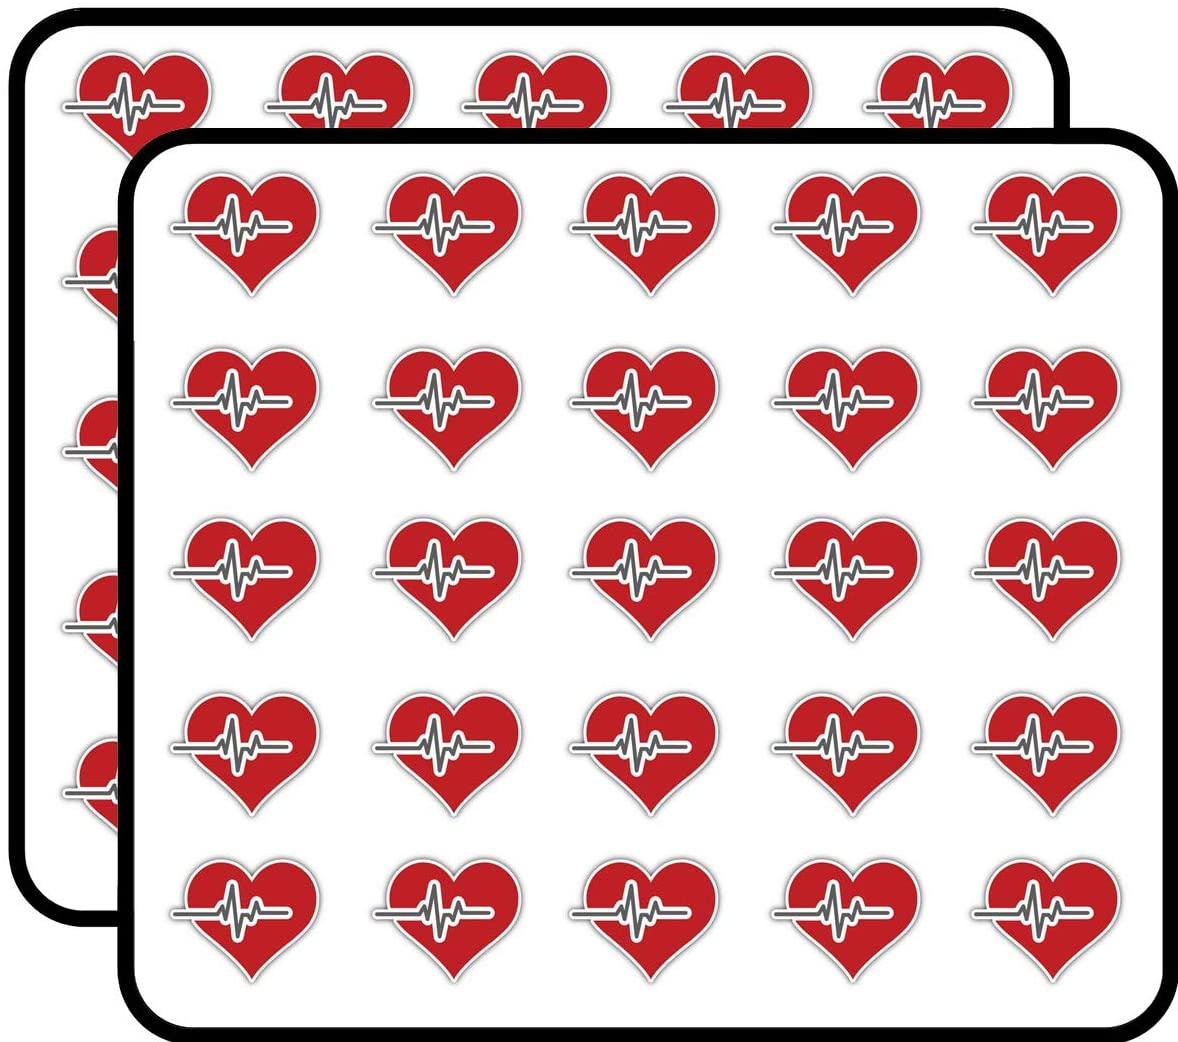 Heart Medicine Symbol Emblem Art Decor Sticker for Scrapbooking, Calendars, Arts, Kids DIY Crafts, Album, Bullet Journals 50 Pack